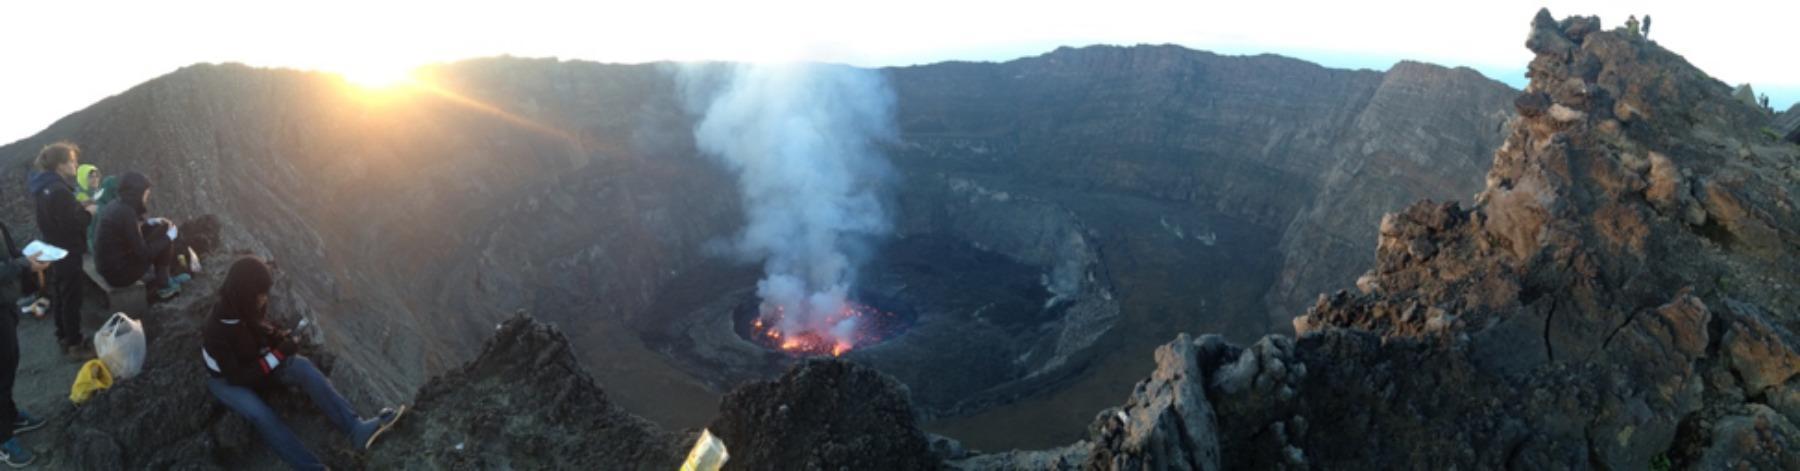 Jimmy Graham visiting Nyirangongo volcano in the Congo just past the Rwandan border